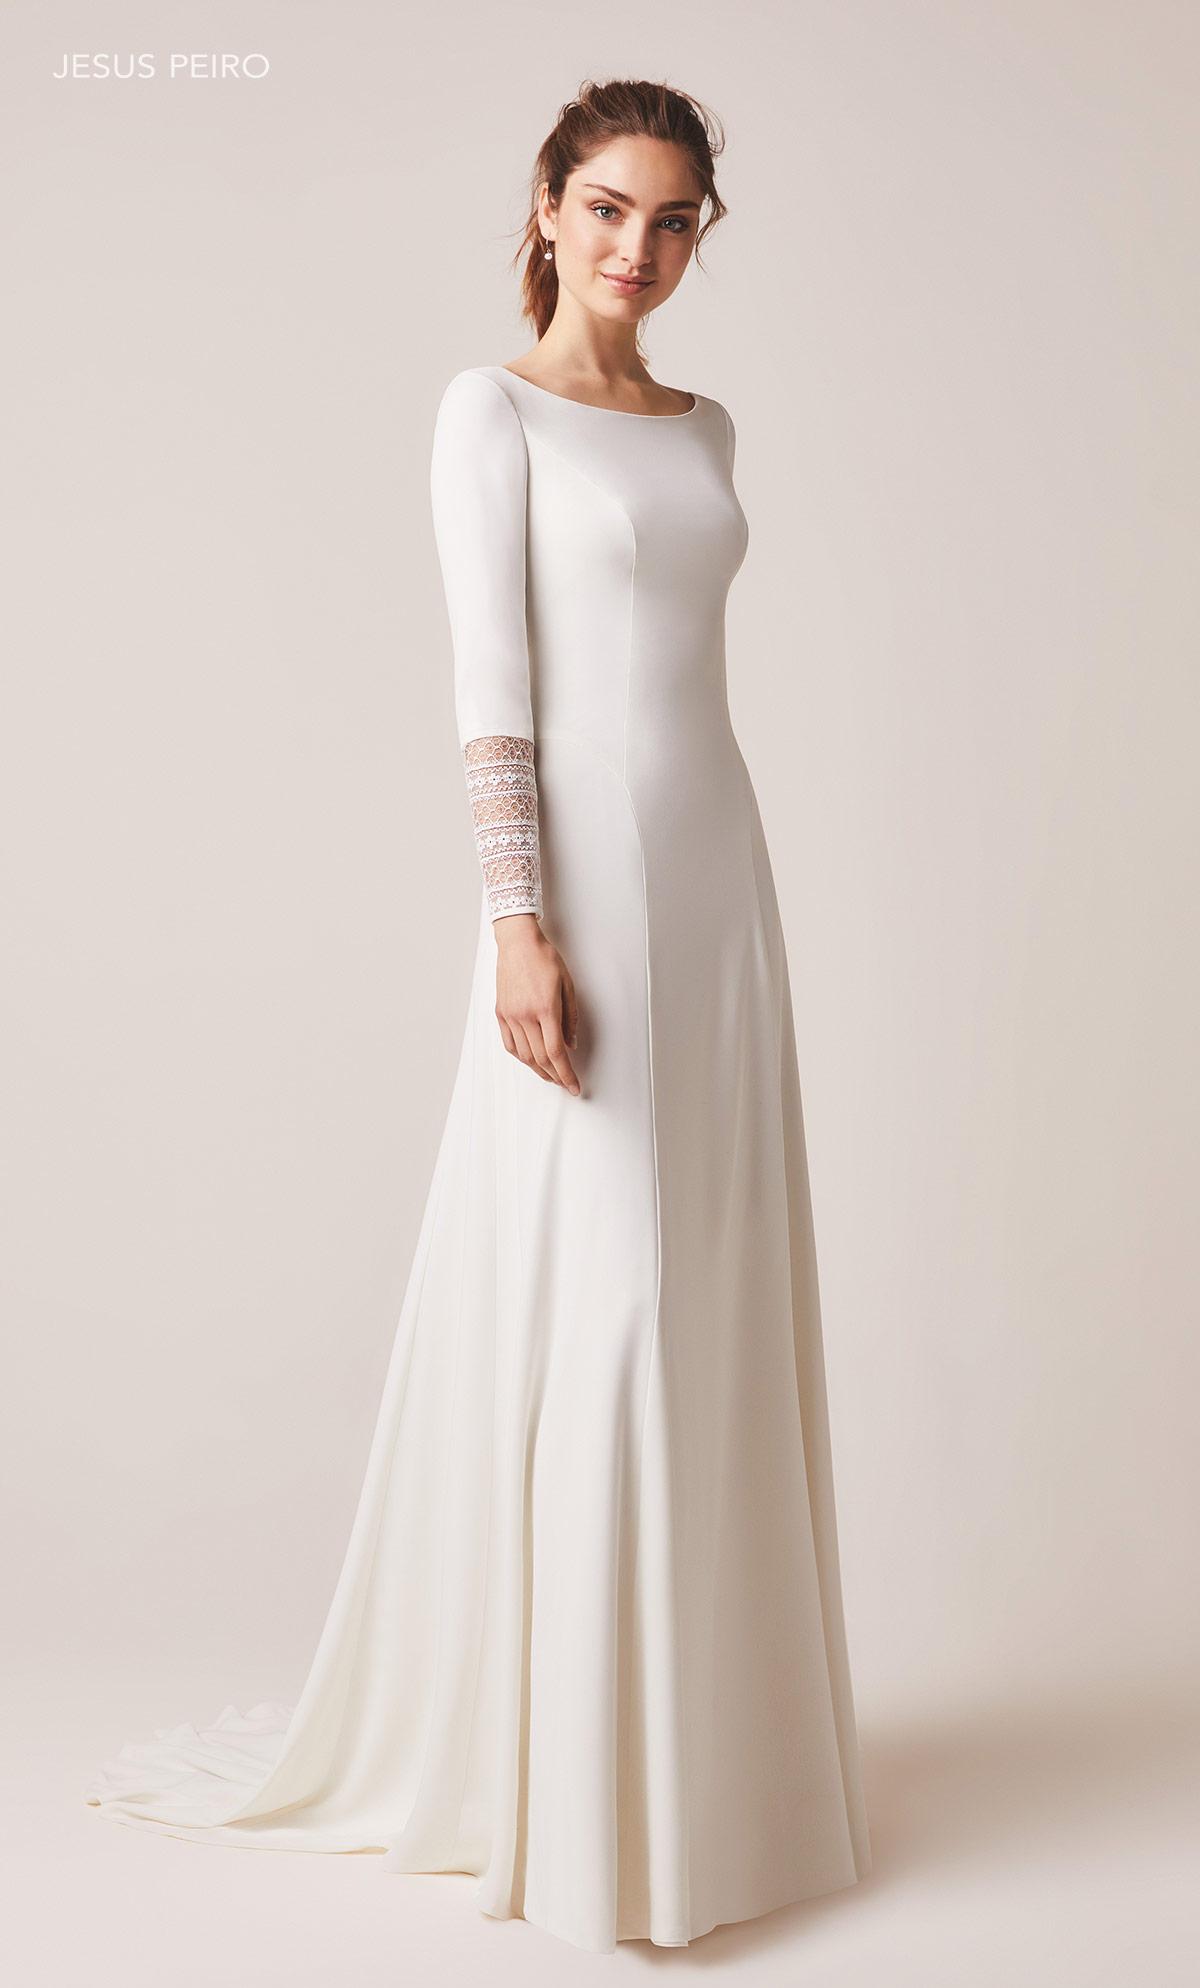 Vestido novia Jesús Peiró Ref.139